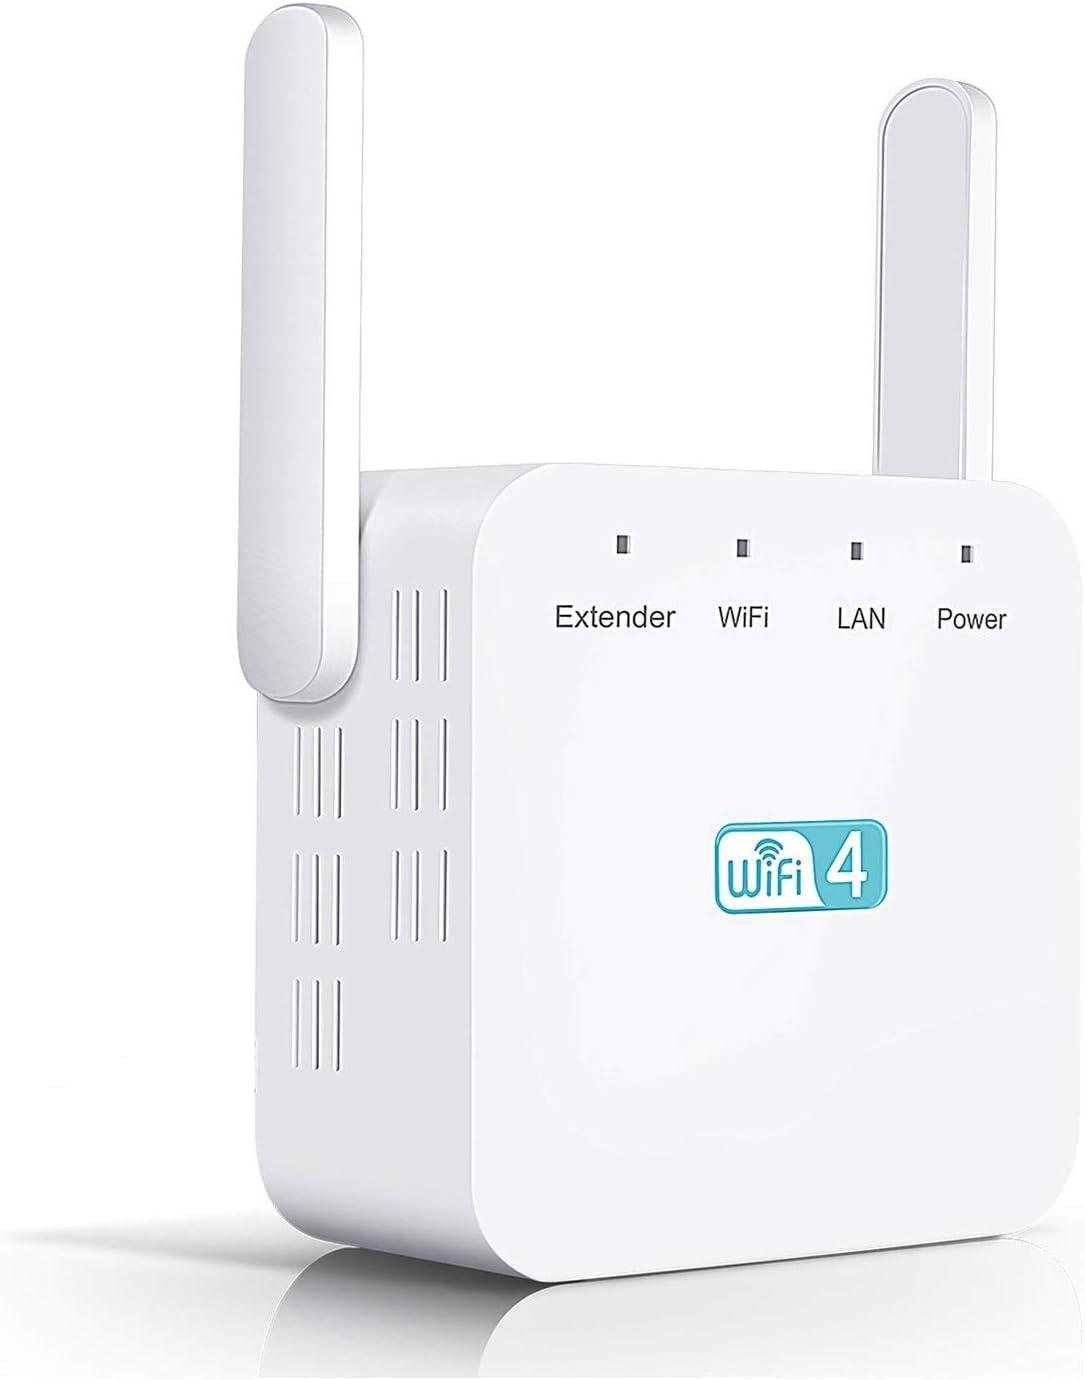 Temfly Amplificador de WiFi,Repetidor WiFi 300Mbps/2.4GHz Repetidor Señal WiFi(Universal),WiFi Repetidor Amplificador Extensor Red WiFi con 2 Antenas ...